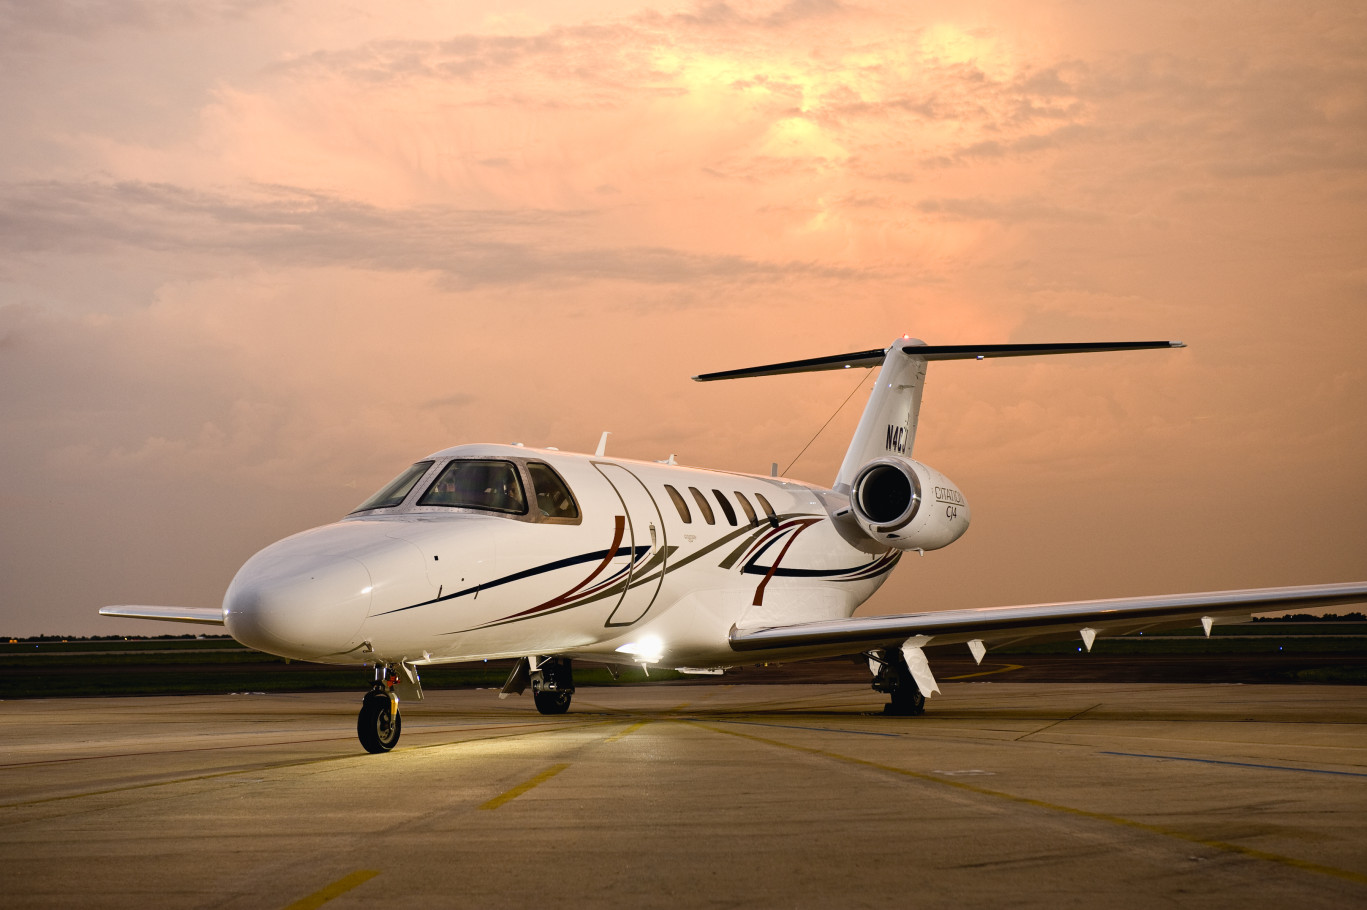 Citation_CJ4_Exterior_2_Light-Jet_Legacy_Aviation_Private_Jet_NetJets_Jet_Charter_TEB_VNY_MIA_PBI_FRG_SFO_FLL_FXE_BED.jpg